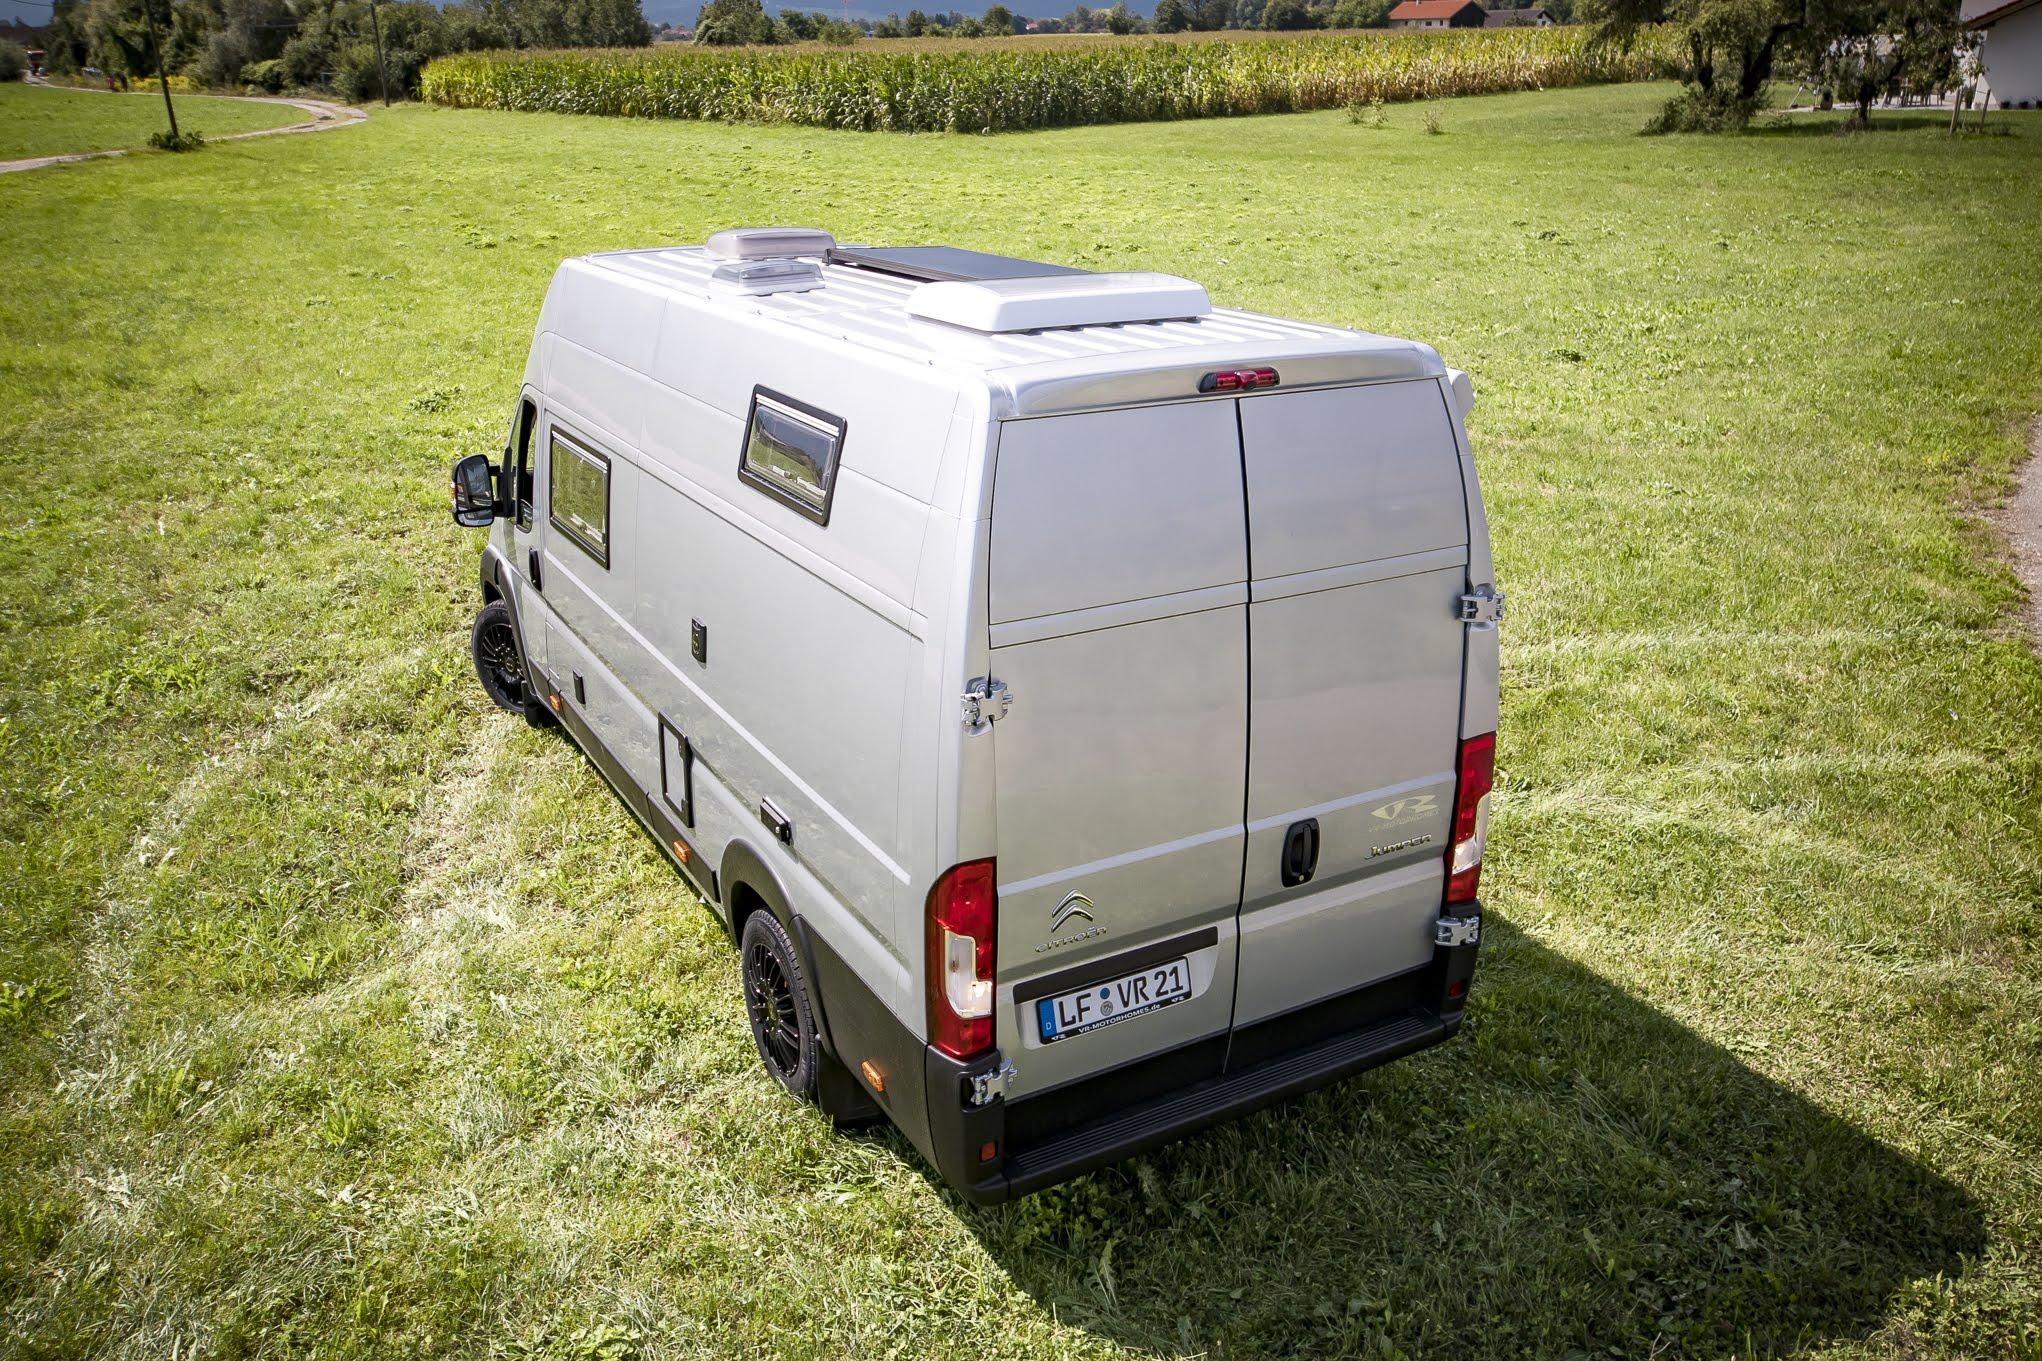 HL VL VR HR Reifen fiat ducato citroen jumper continental vancontact vr motorhomes luxus camper